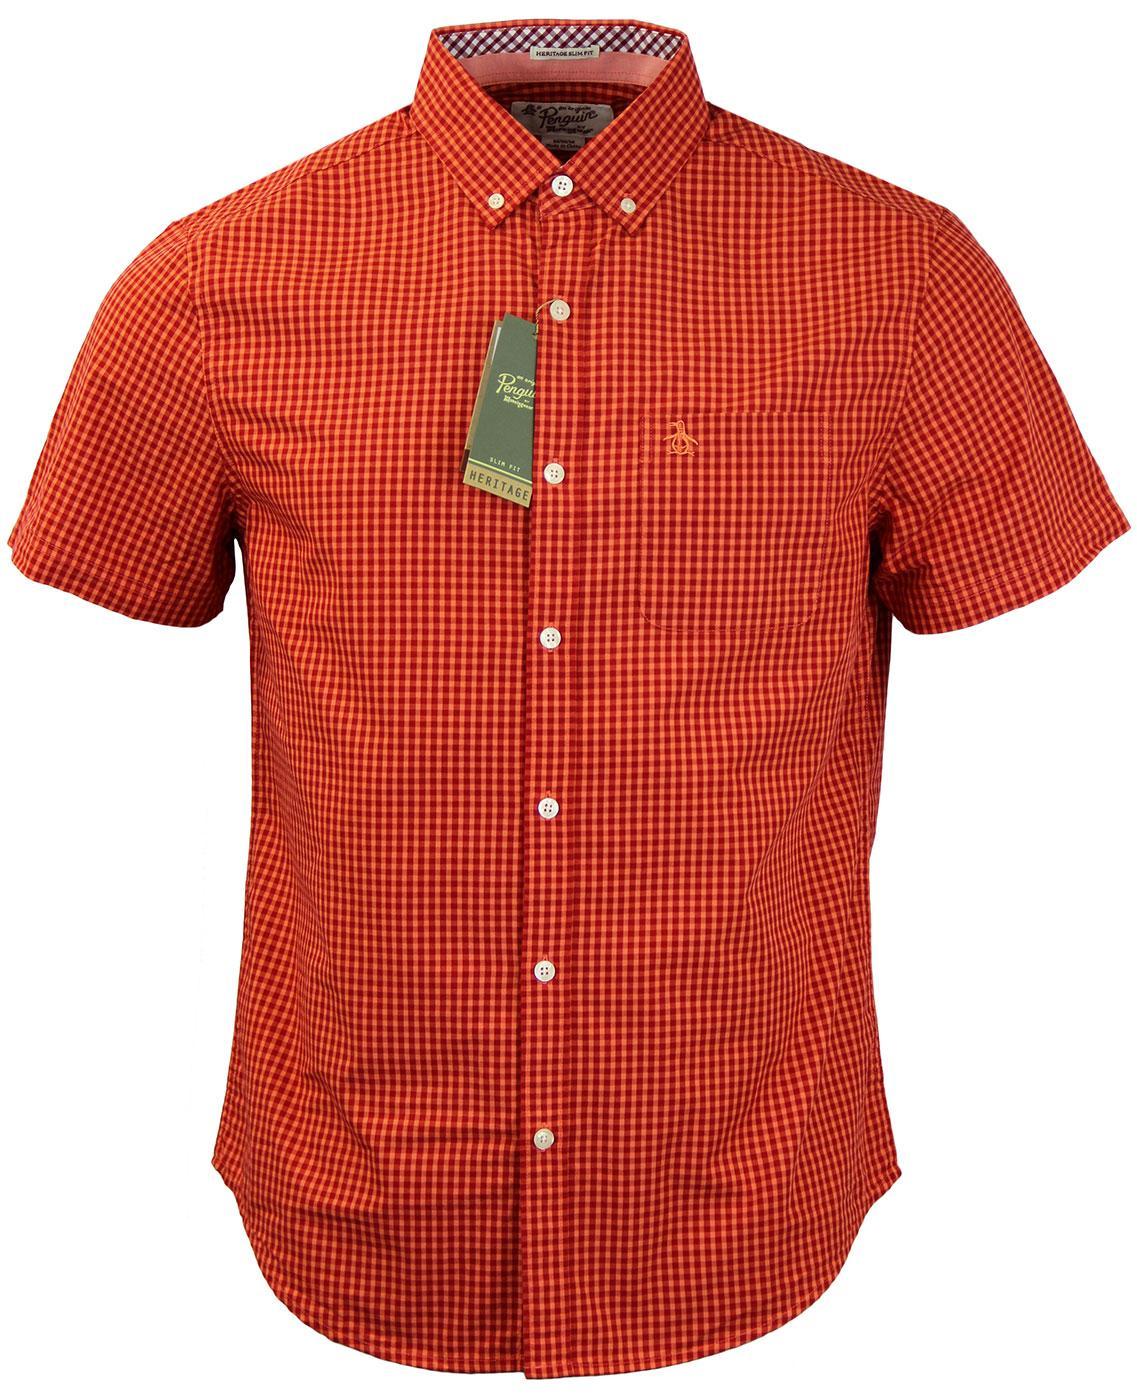 Belan Gingham ORIGINAL PENGUIN Retro Mod S/S Shirt